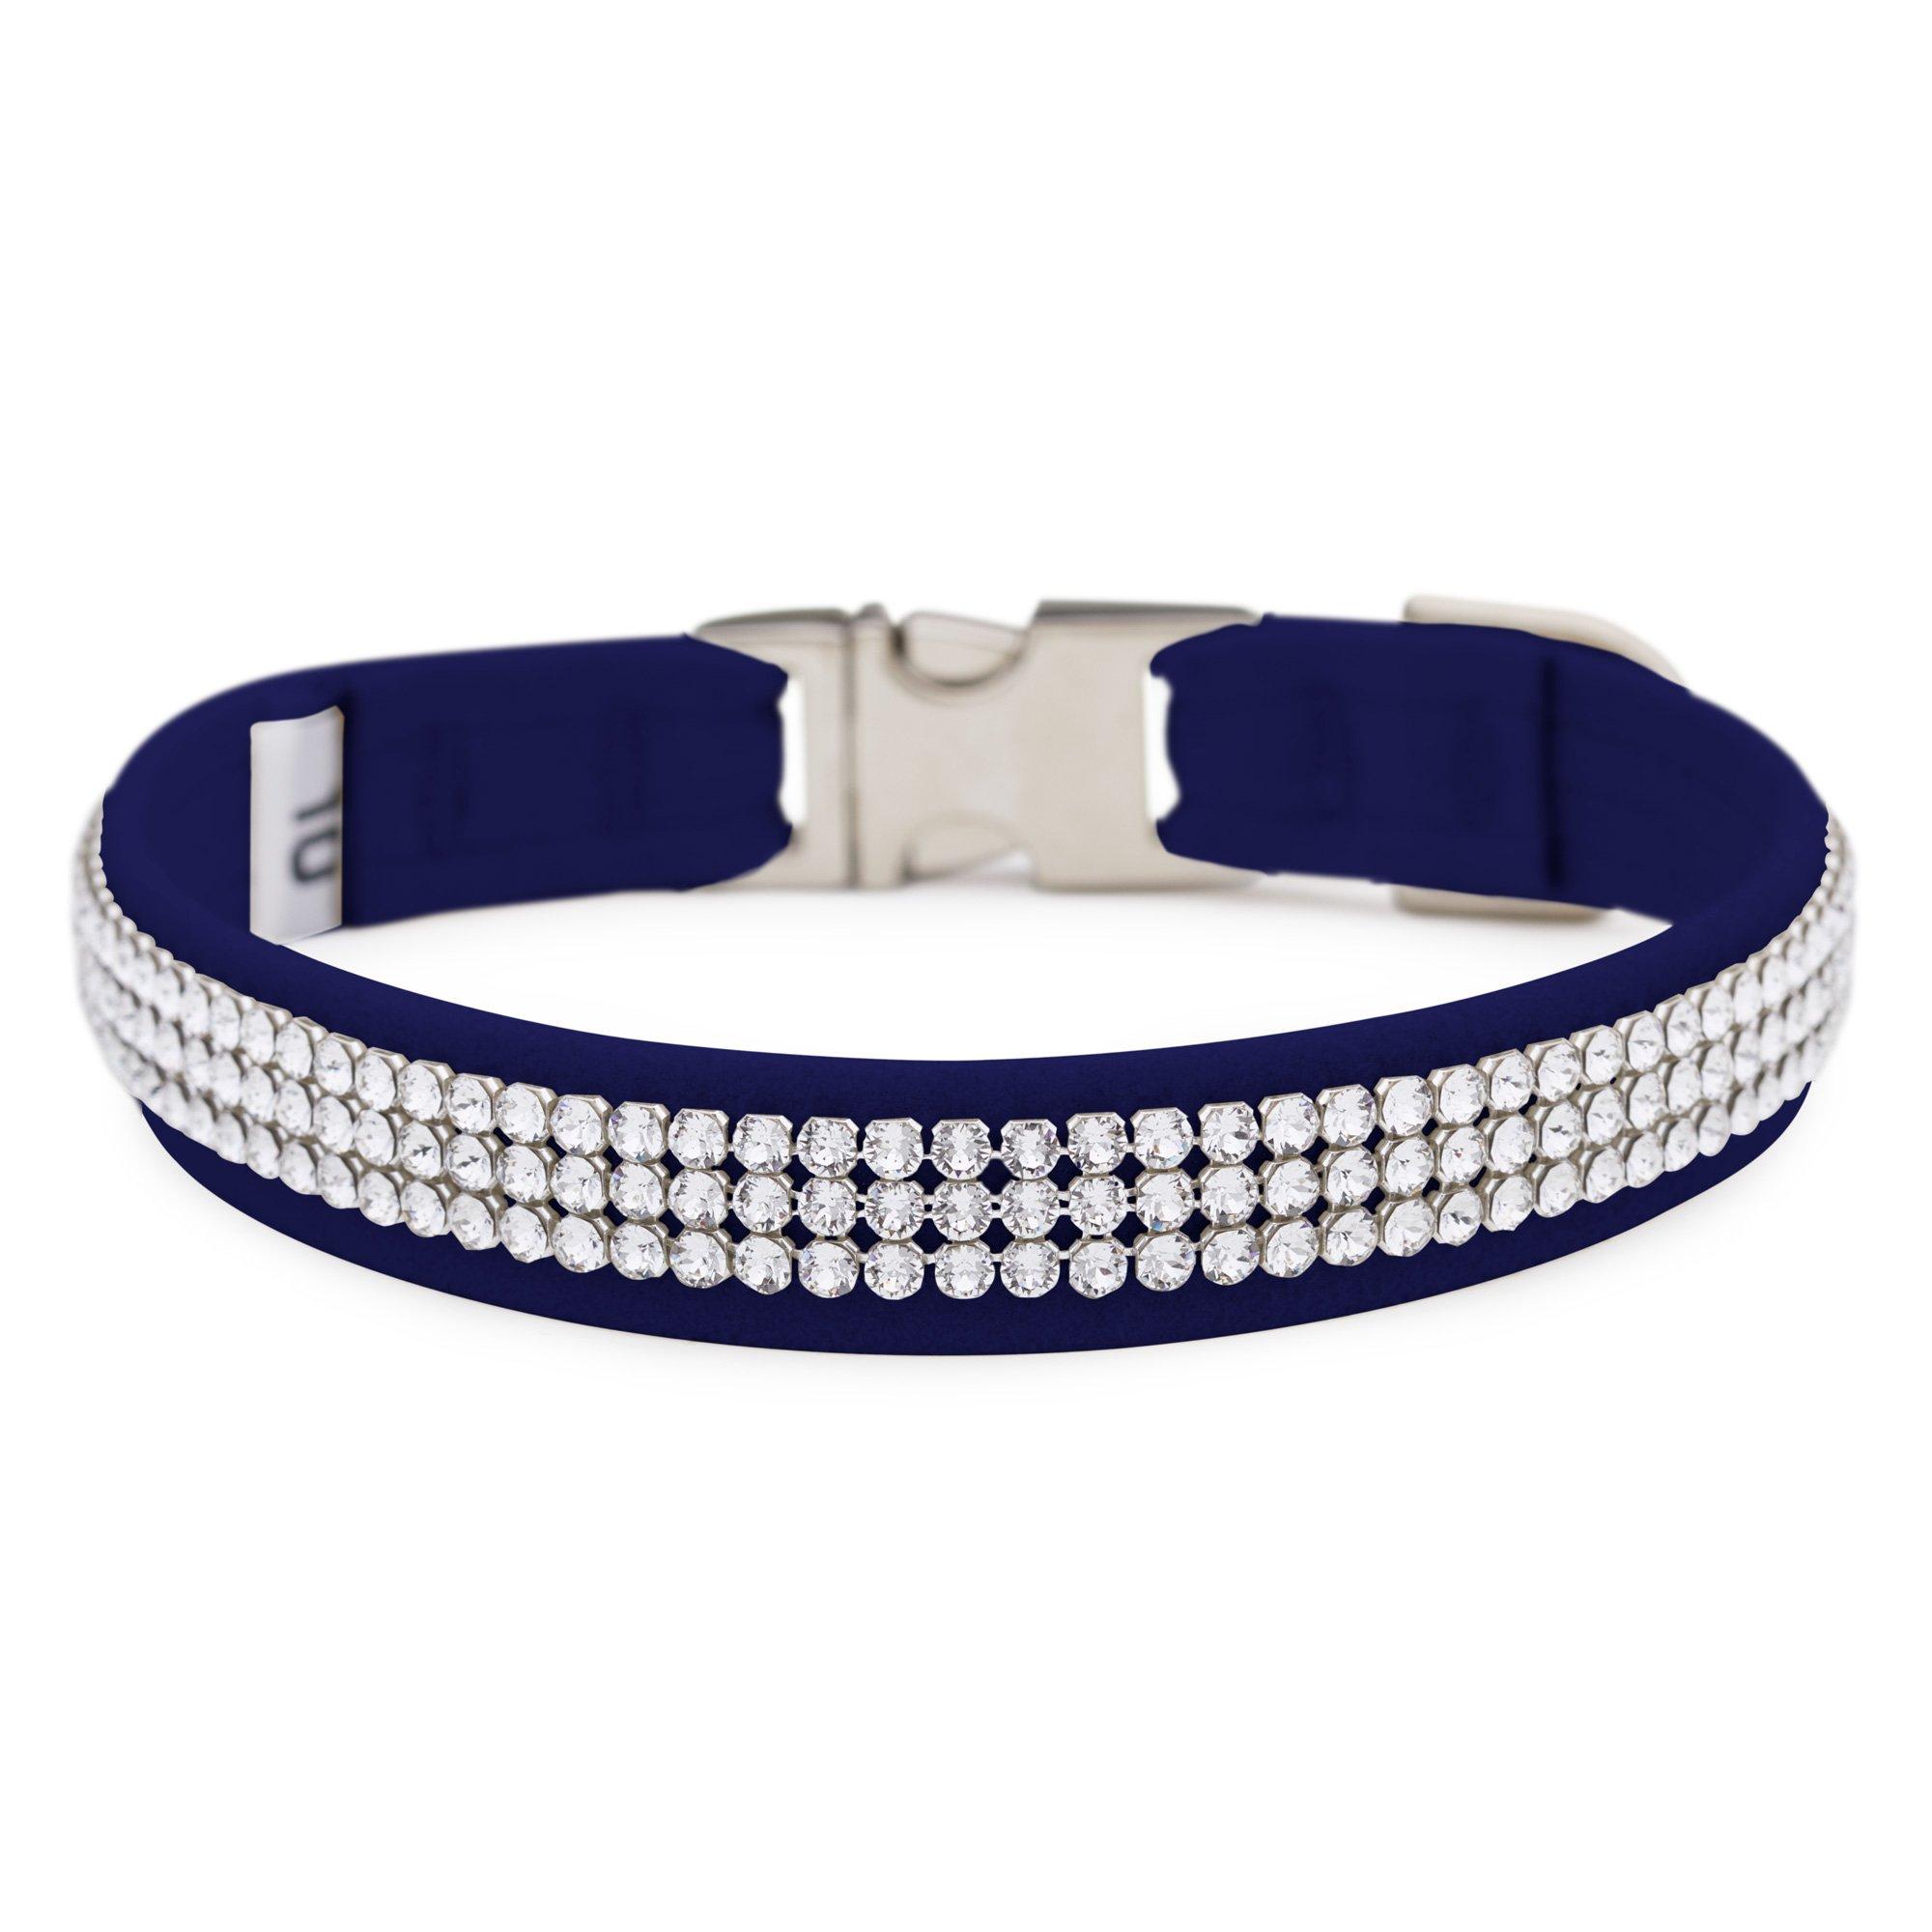 Indigo 3 Row Giltmore Perfect Fit Collar